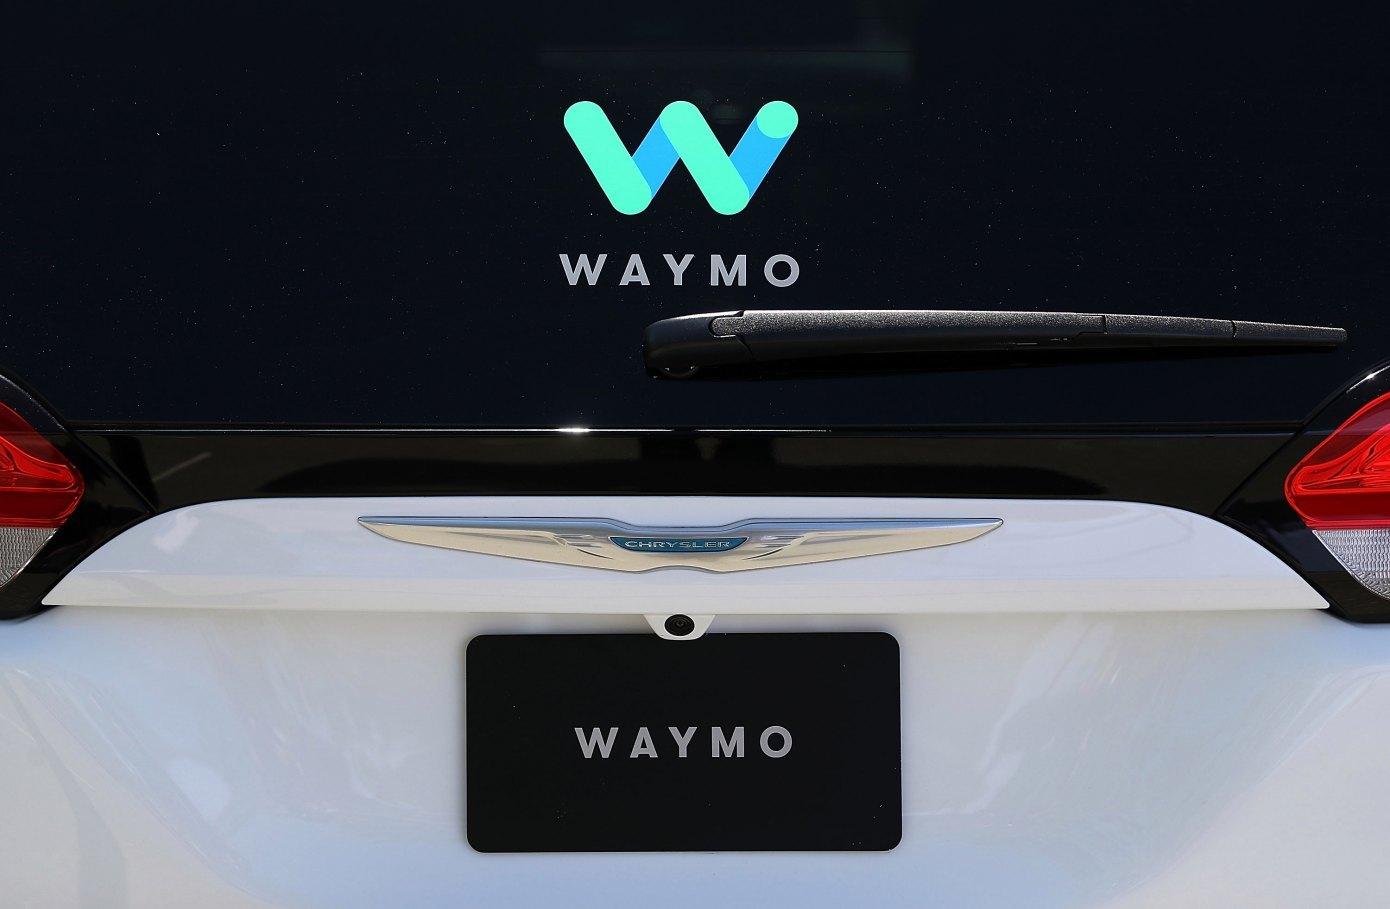 Waymo自动驾驶出租车受热捧 试点首月运6299名乘客